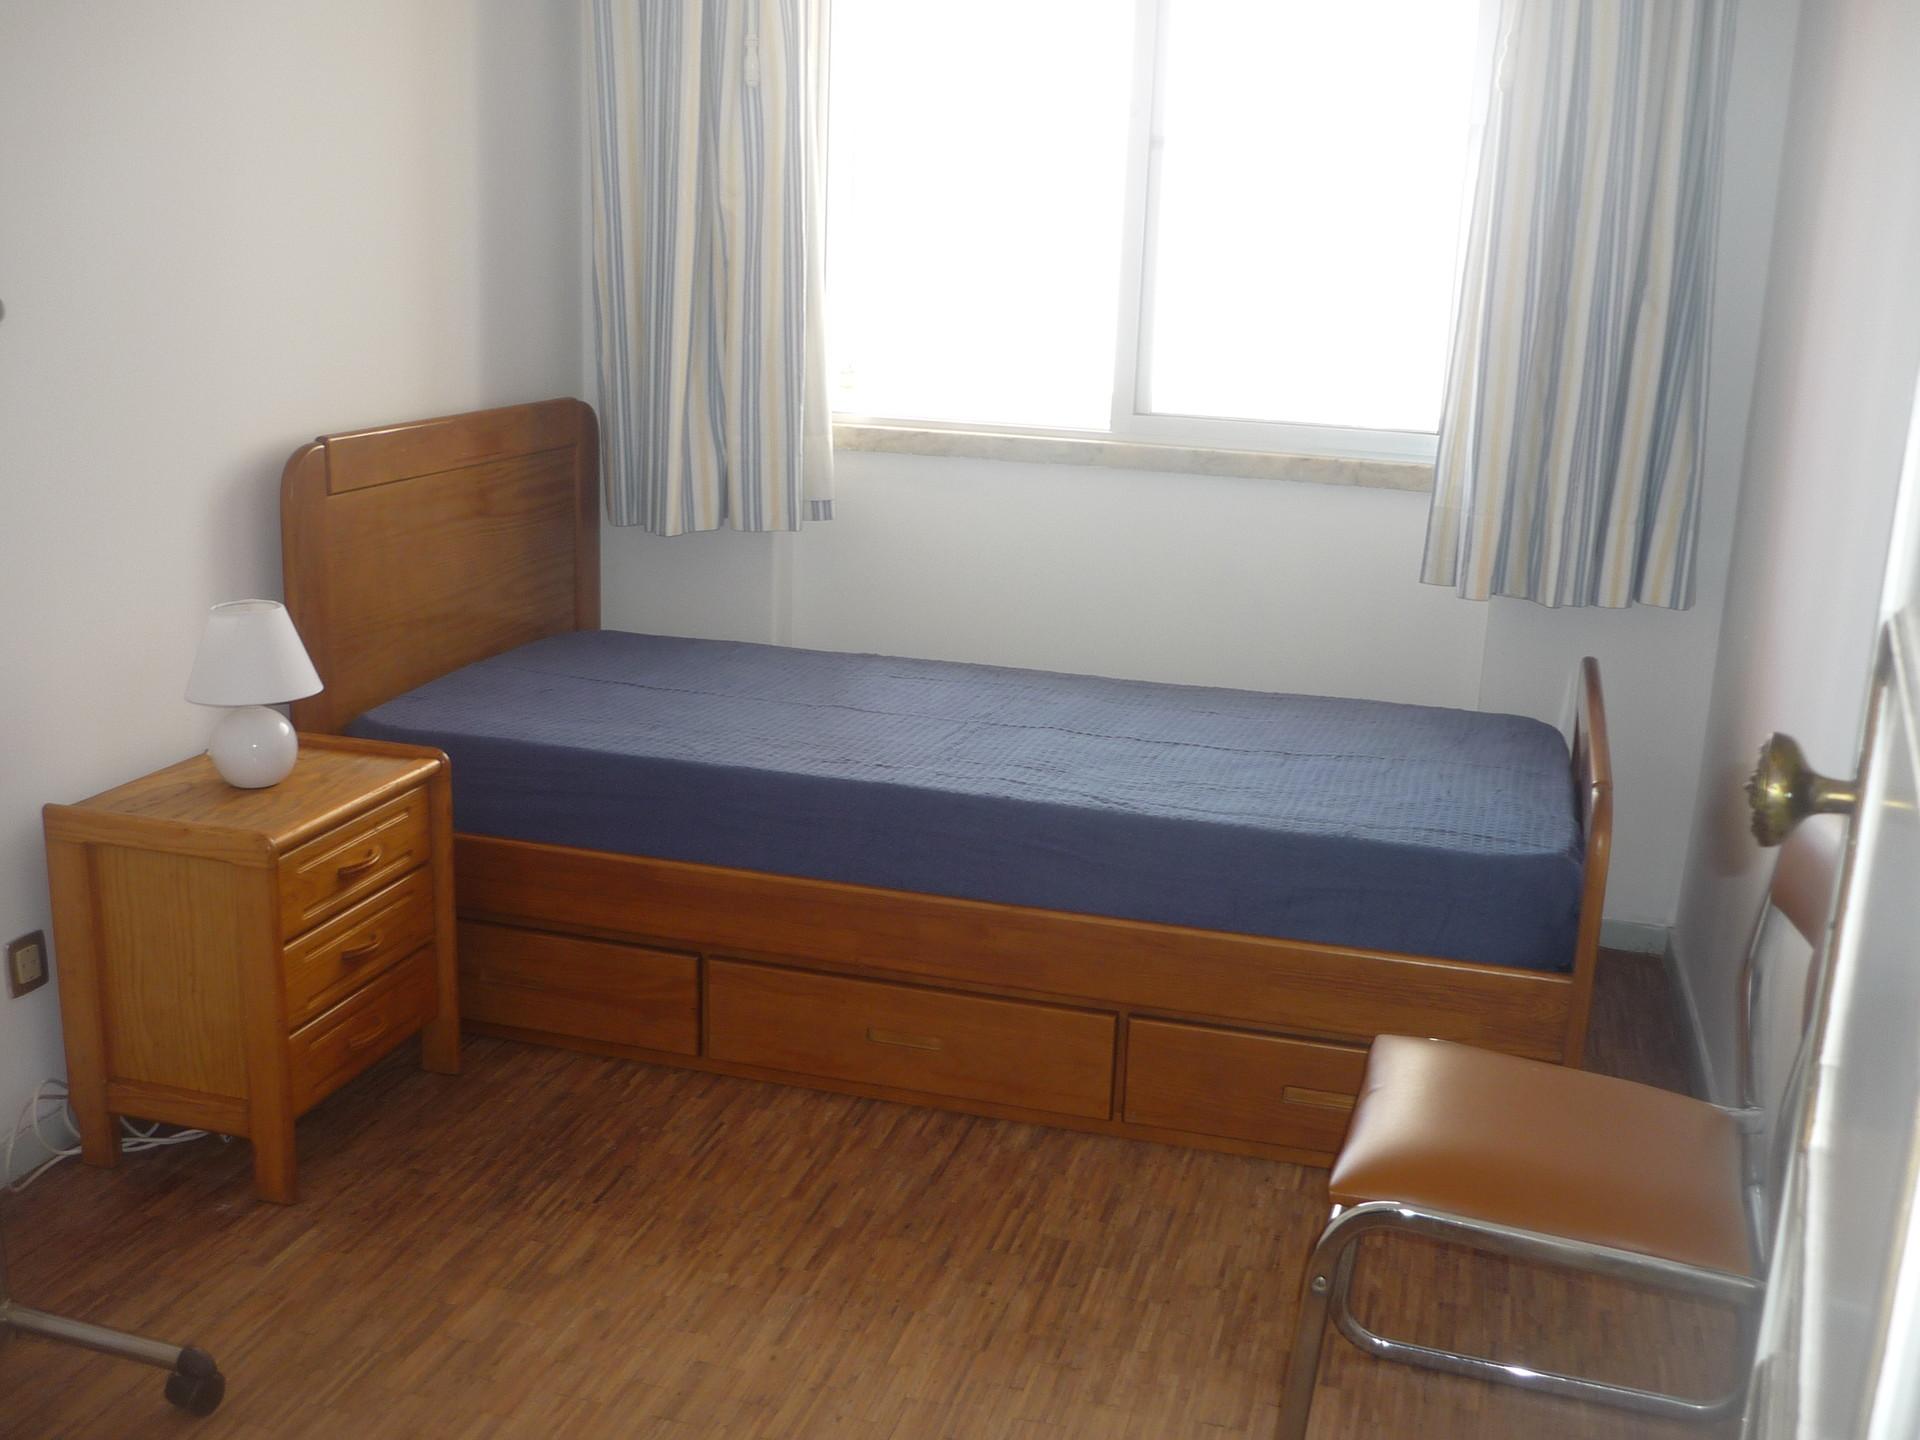 Single Room for Rent in Benfica  Alugo Quarto Individual